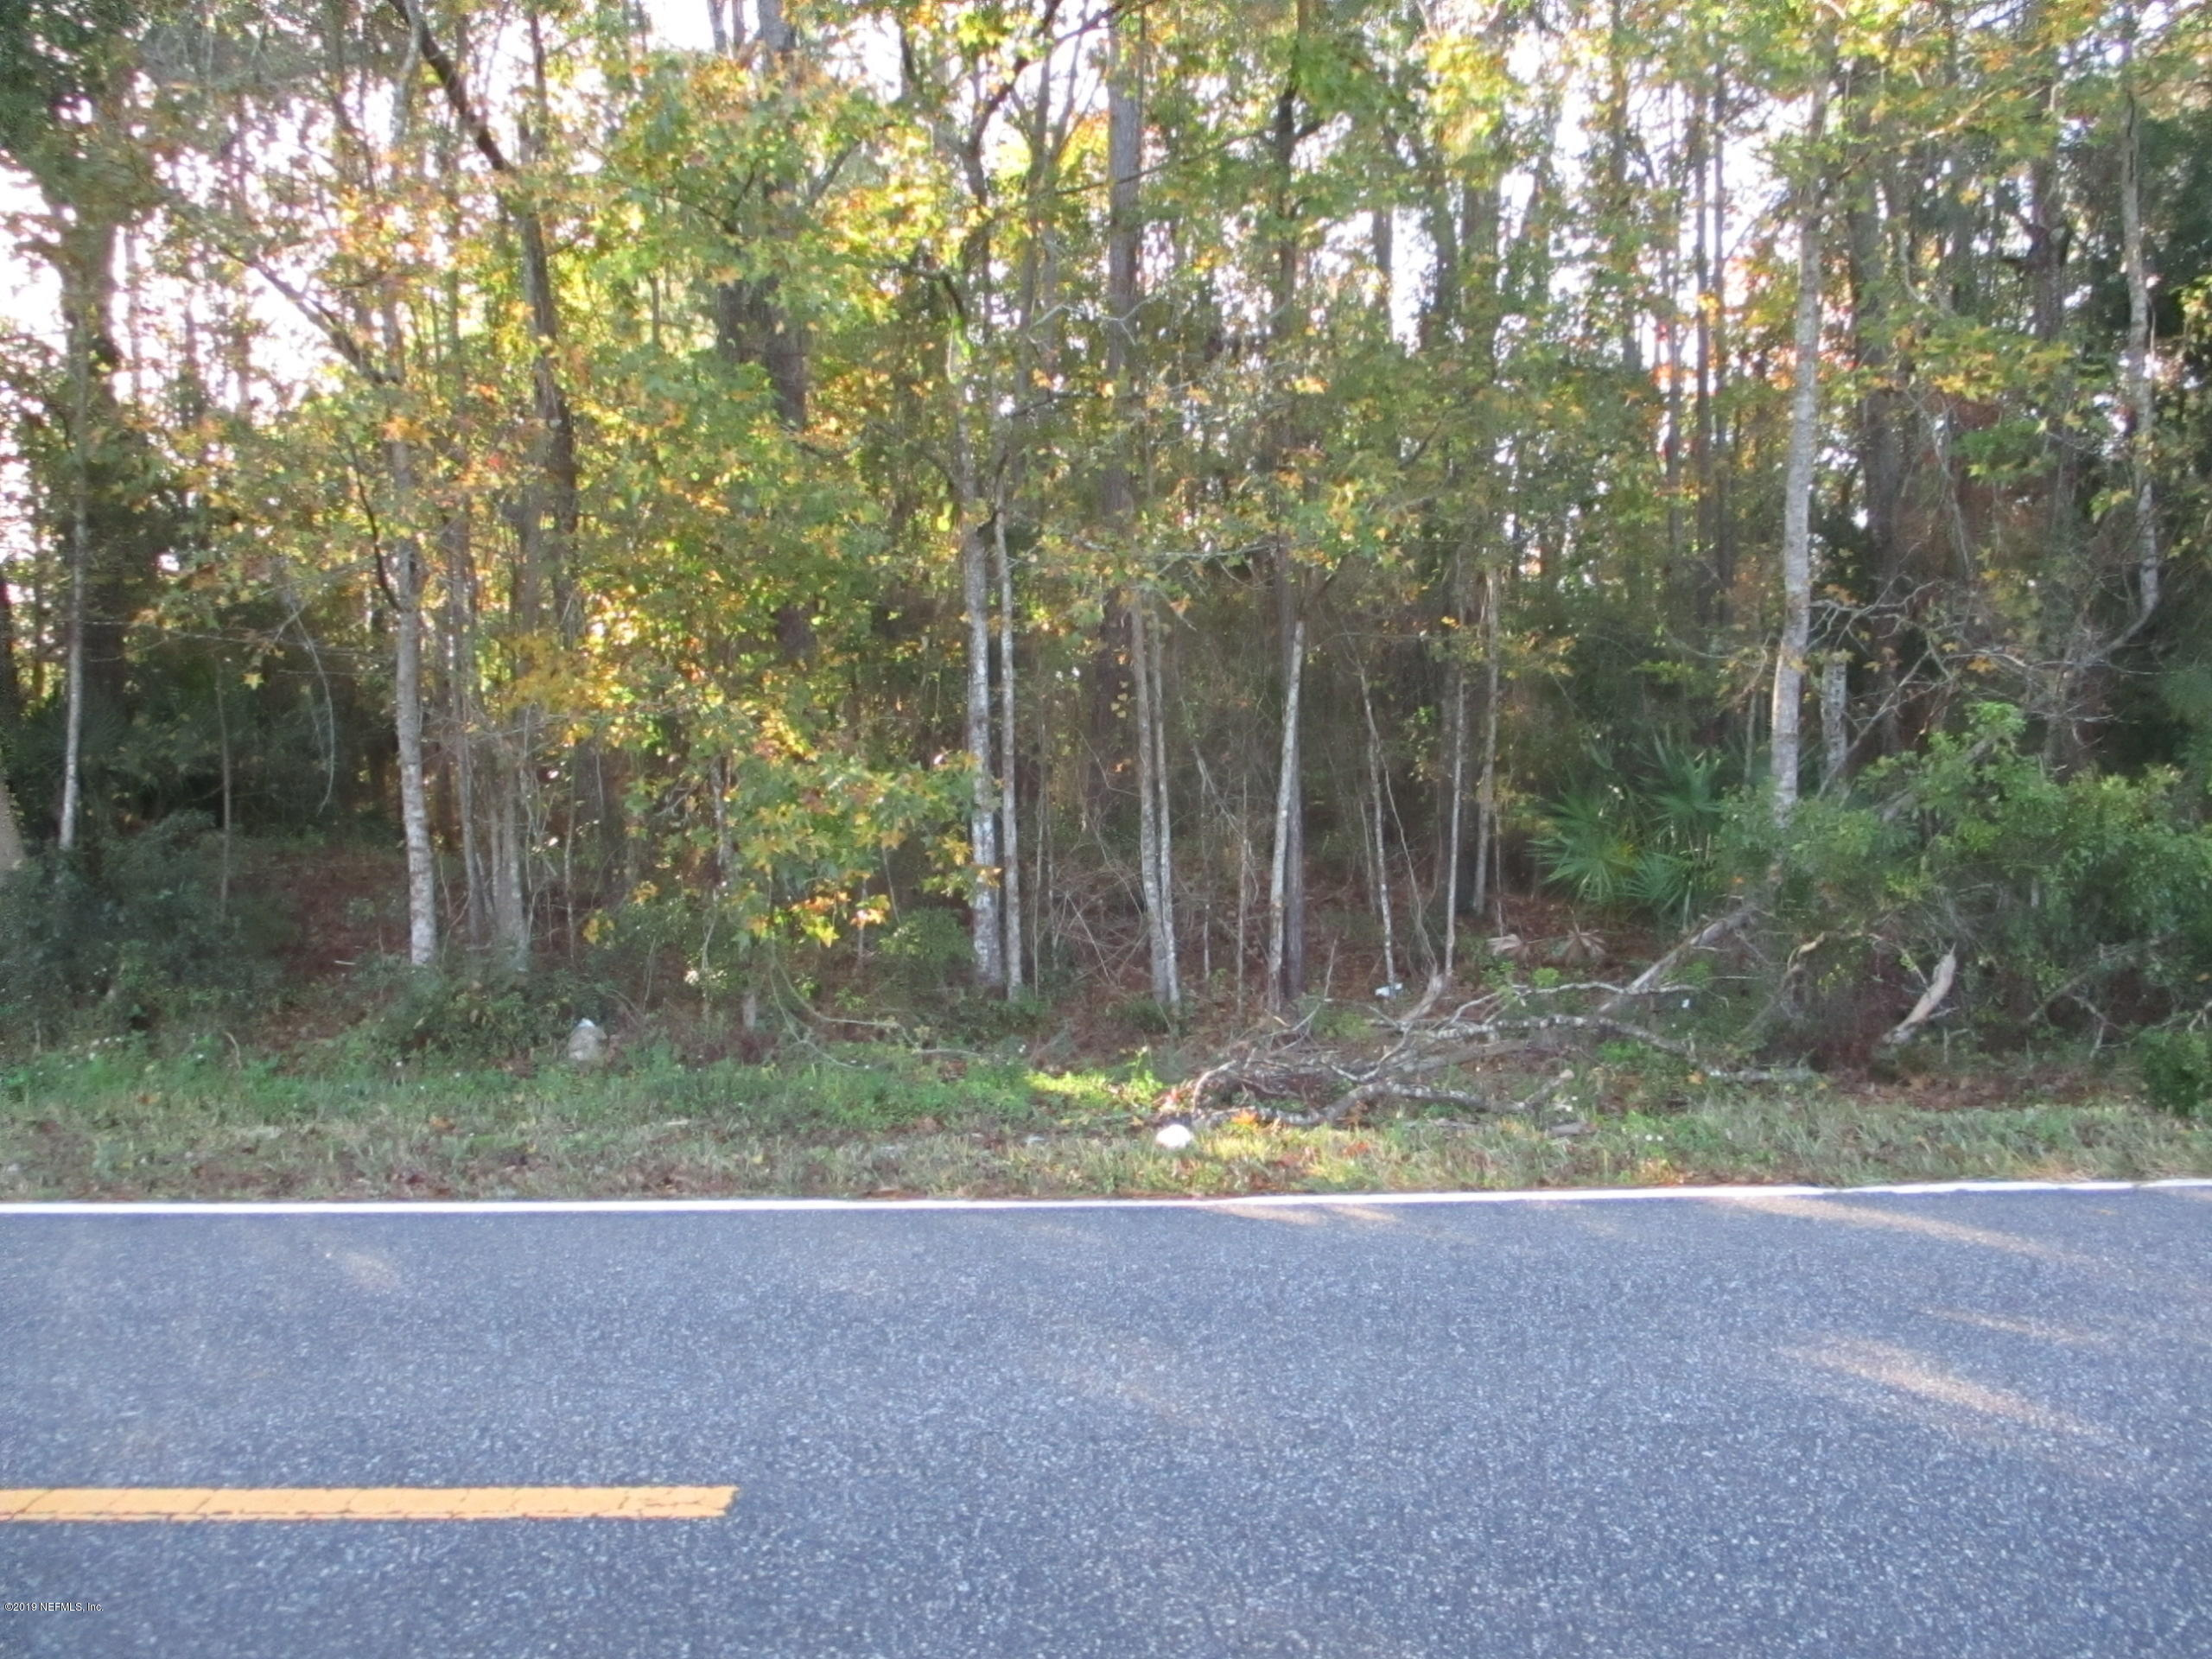 0 WAGNER, JACKSONVILLE, FLORIDA 32219, ,Vacant land,For sale,WAGNER,1028607